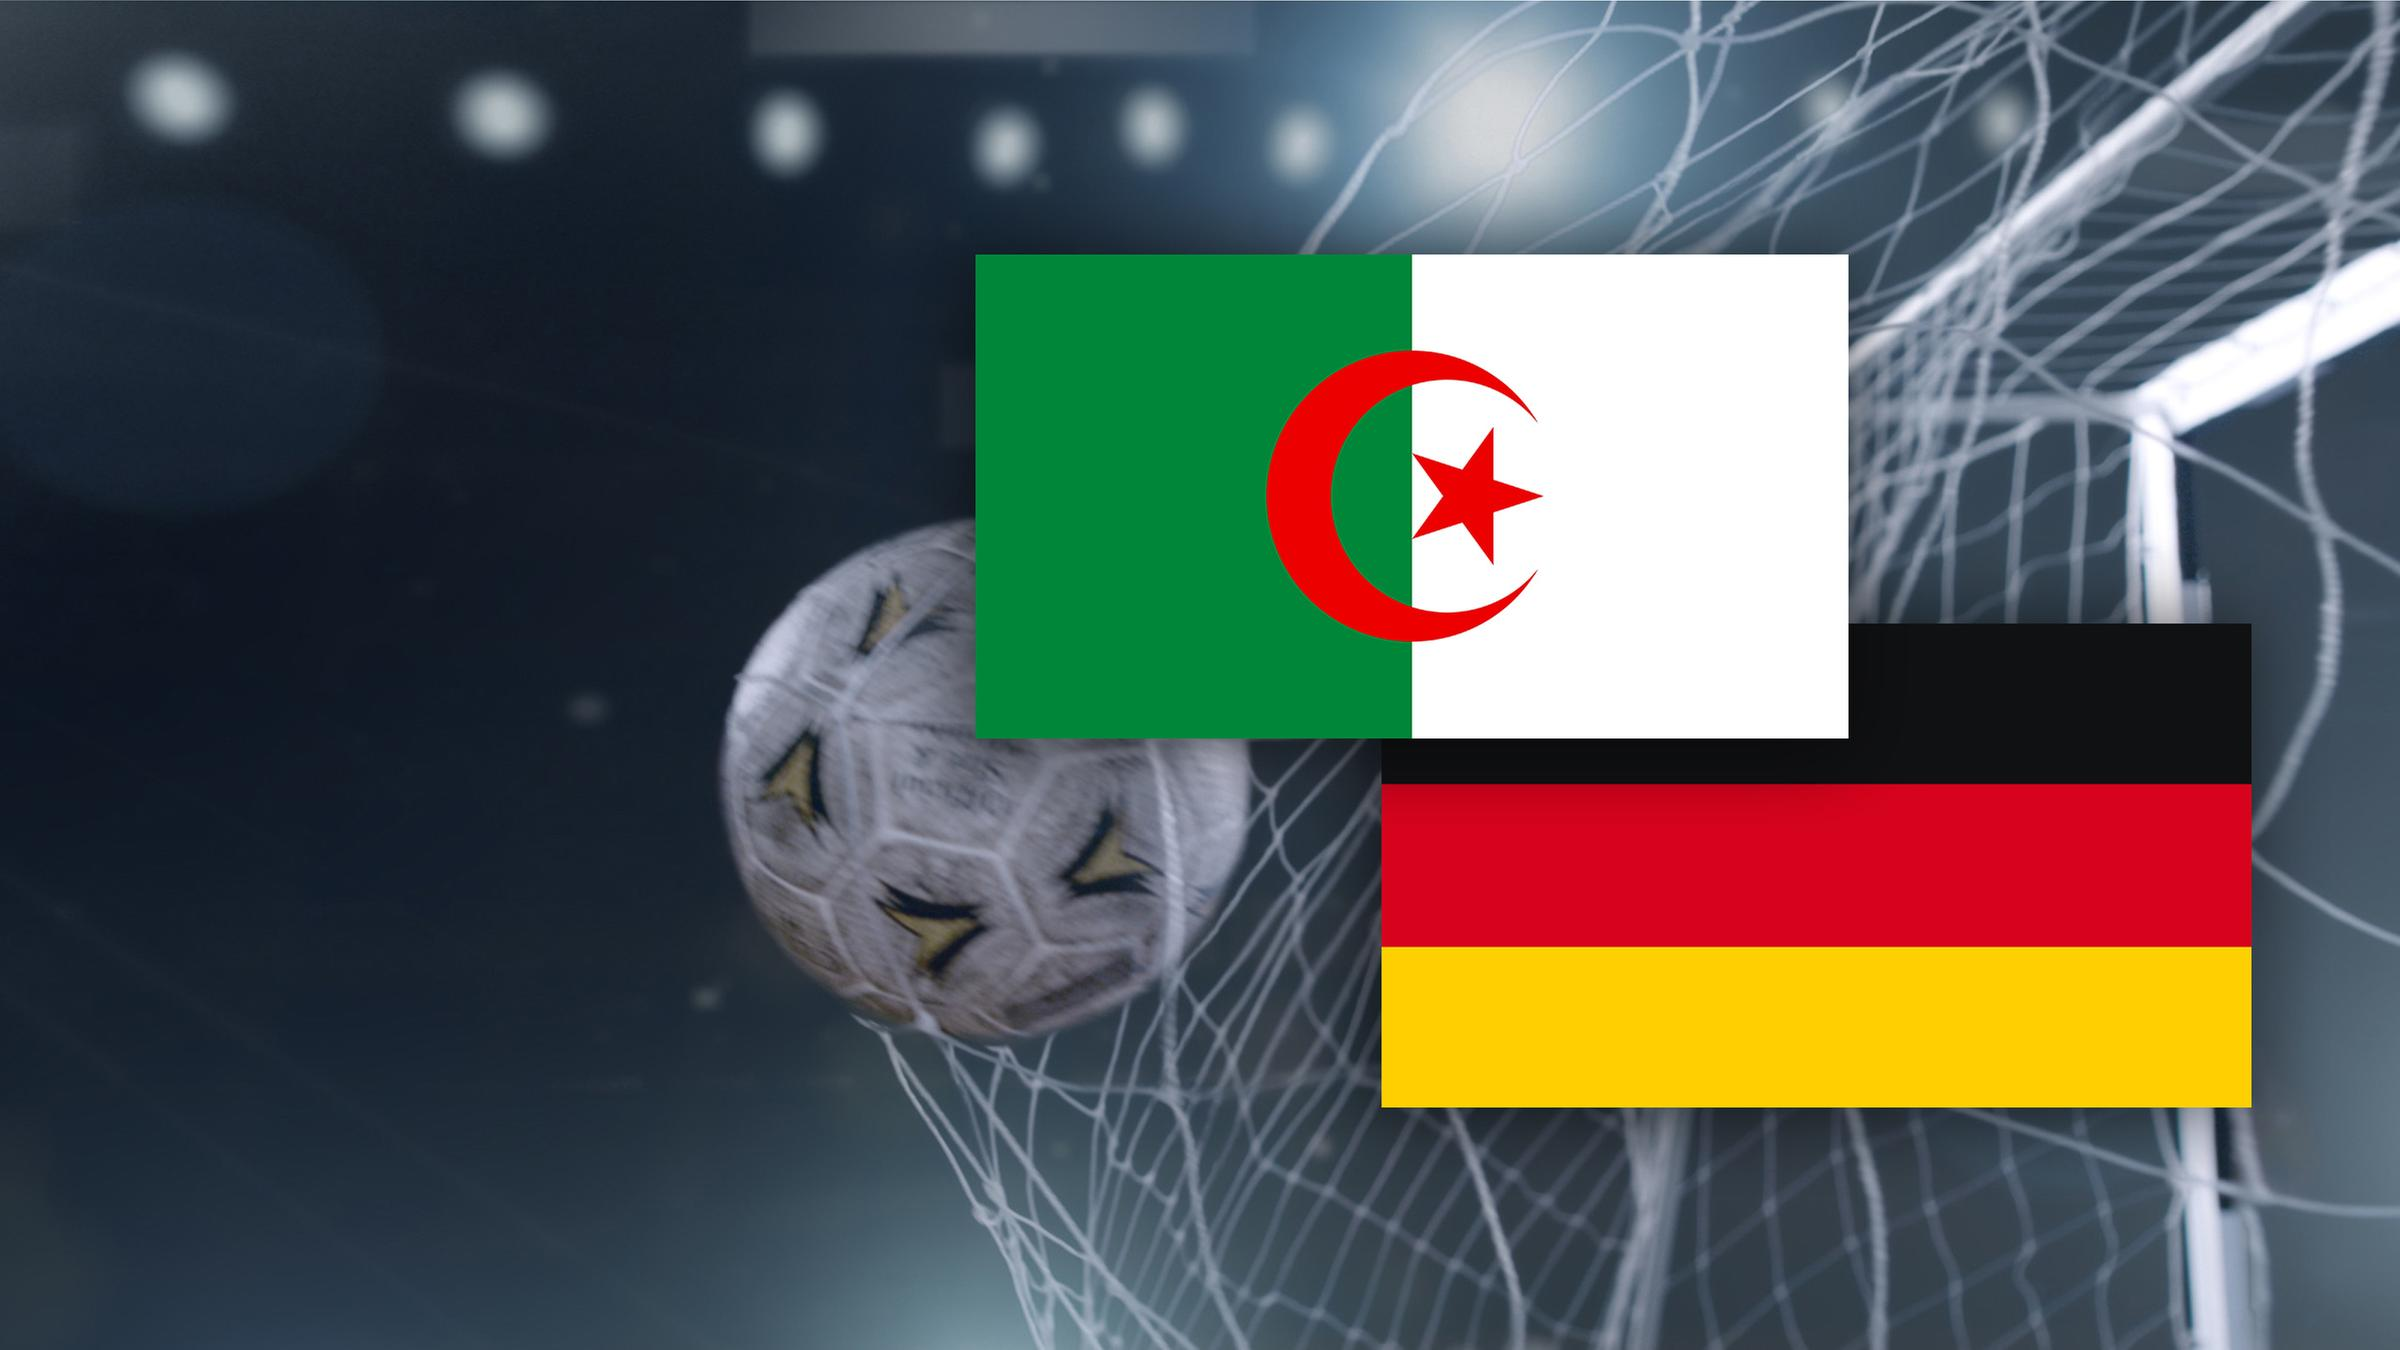 https www zdf de sport zdf sportextra handball olympia qualifikation algerien deutschland 100 html